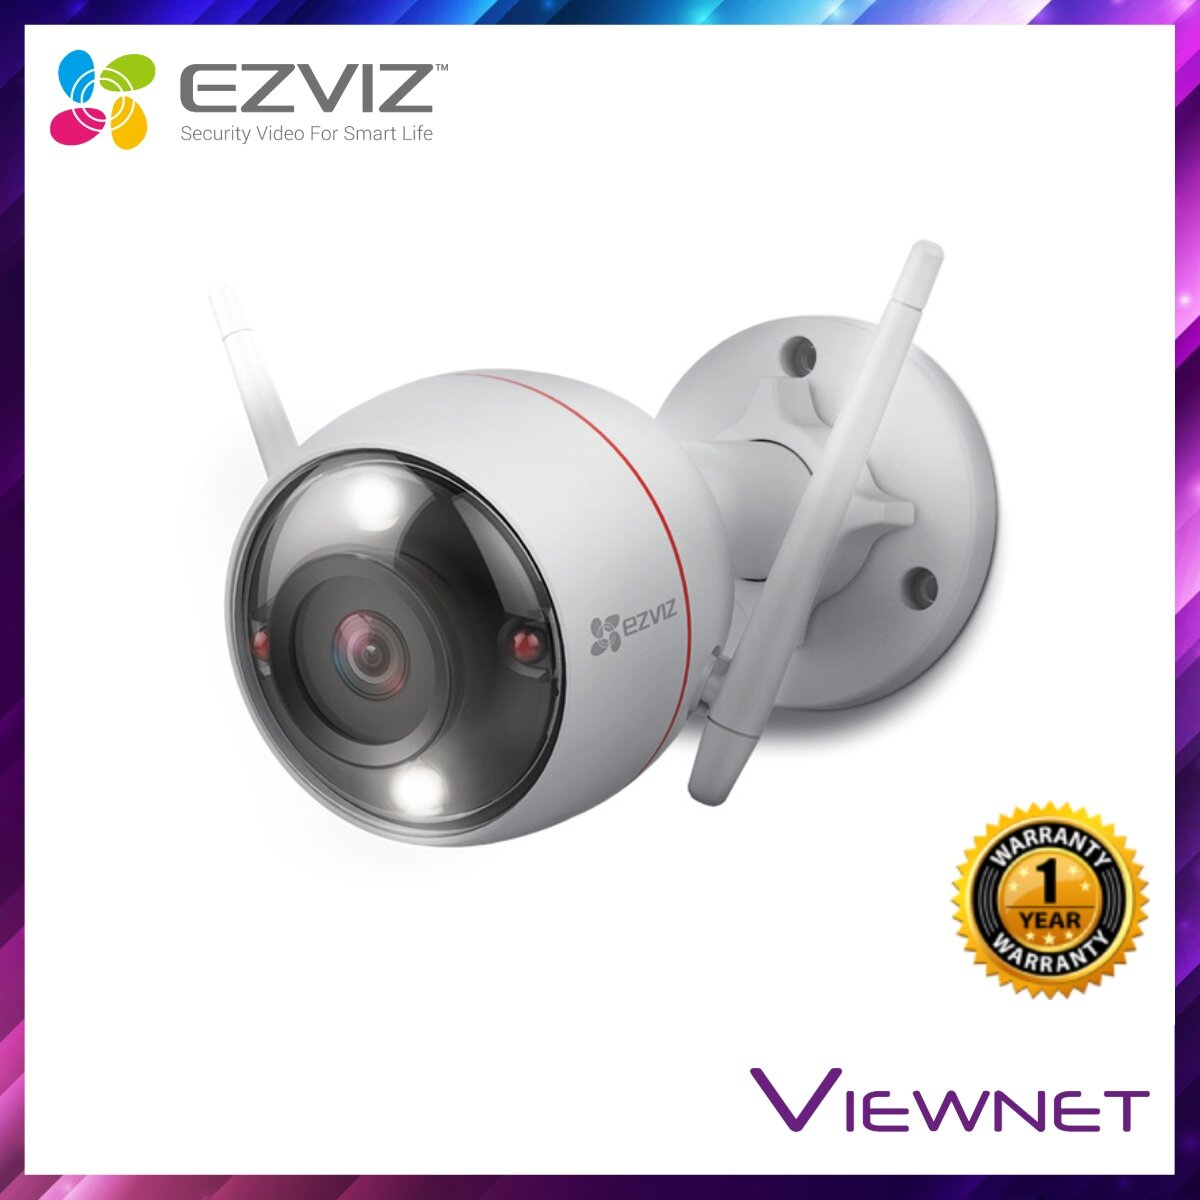 Ezviz C3W IP Camera, 1080P Full HD, 118° Degree Outdoor, IP66, 2.8MM, CCTV, *Max 128GB / 256GB TF*, Black & White Night Vision / Color Night Vision (CS-CV310-A0-1B2WFR) / (CS-CV310-A0-3C2WFRL)